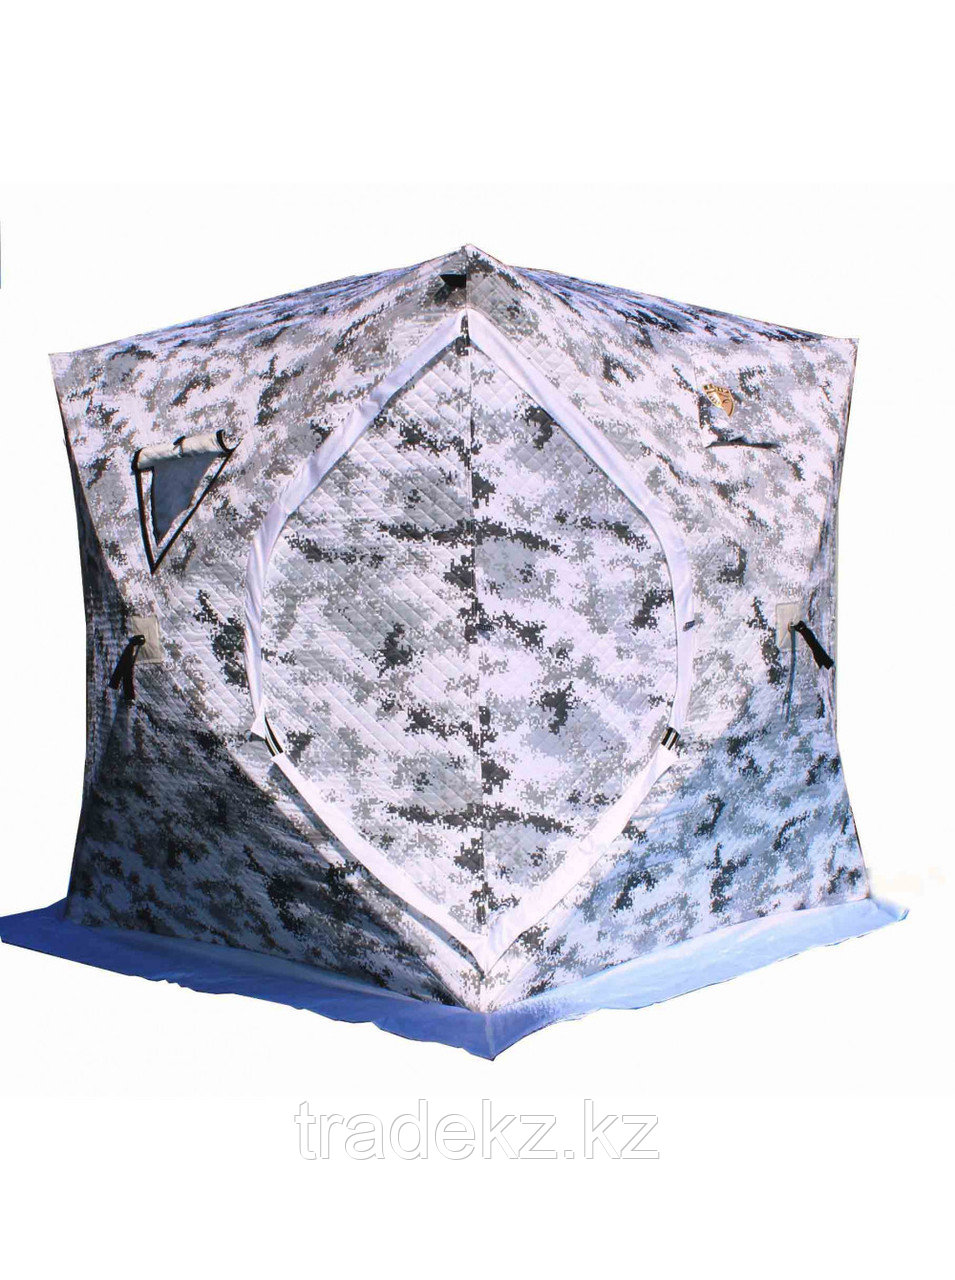 "Палатка для зимней рыбалки куб ""CONDOR""  утепленная 1,8х1,8х1,95 м, JX-0129"